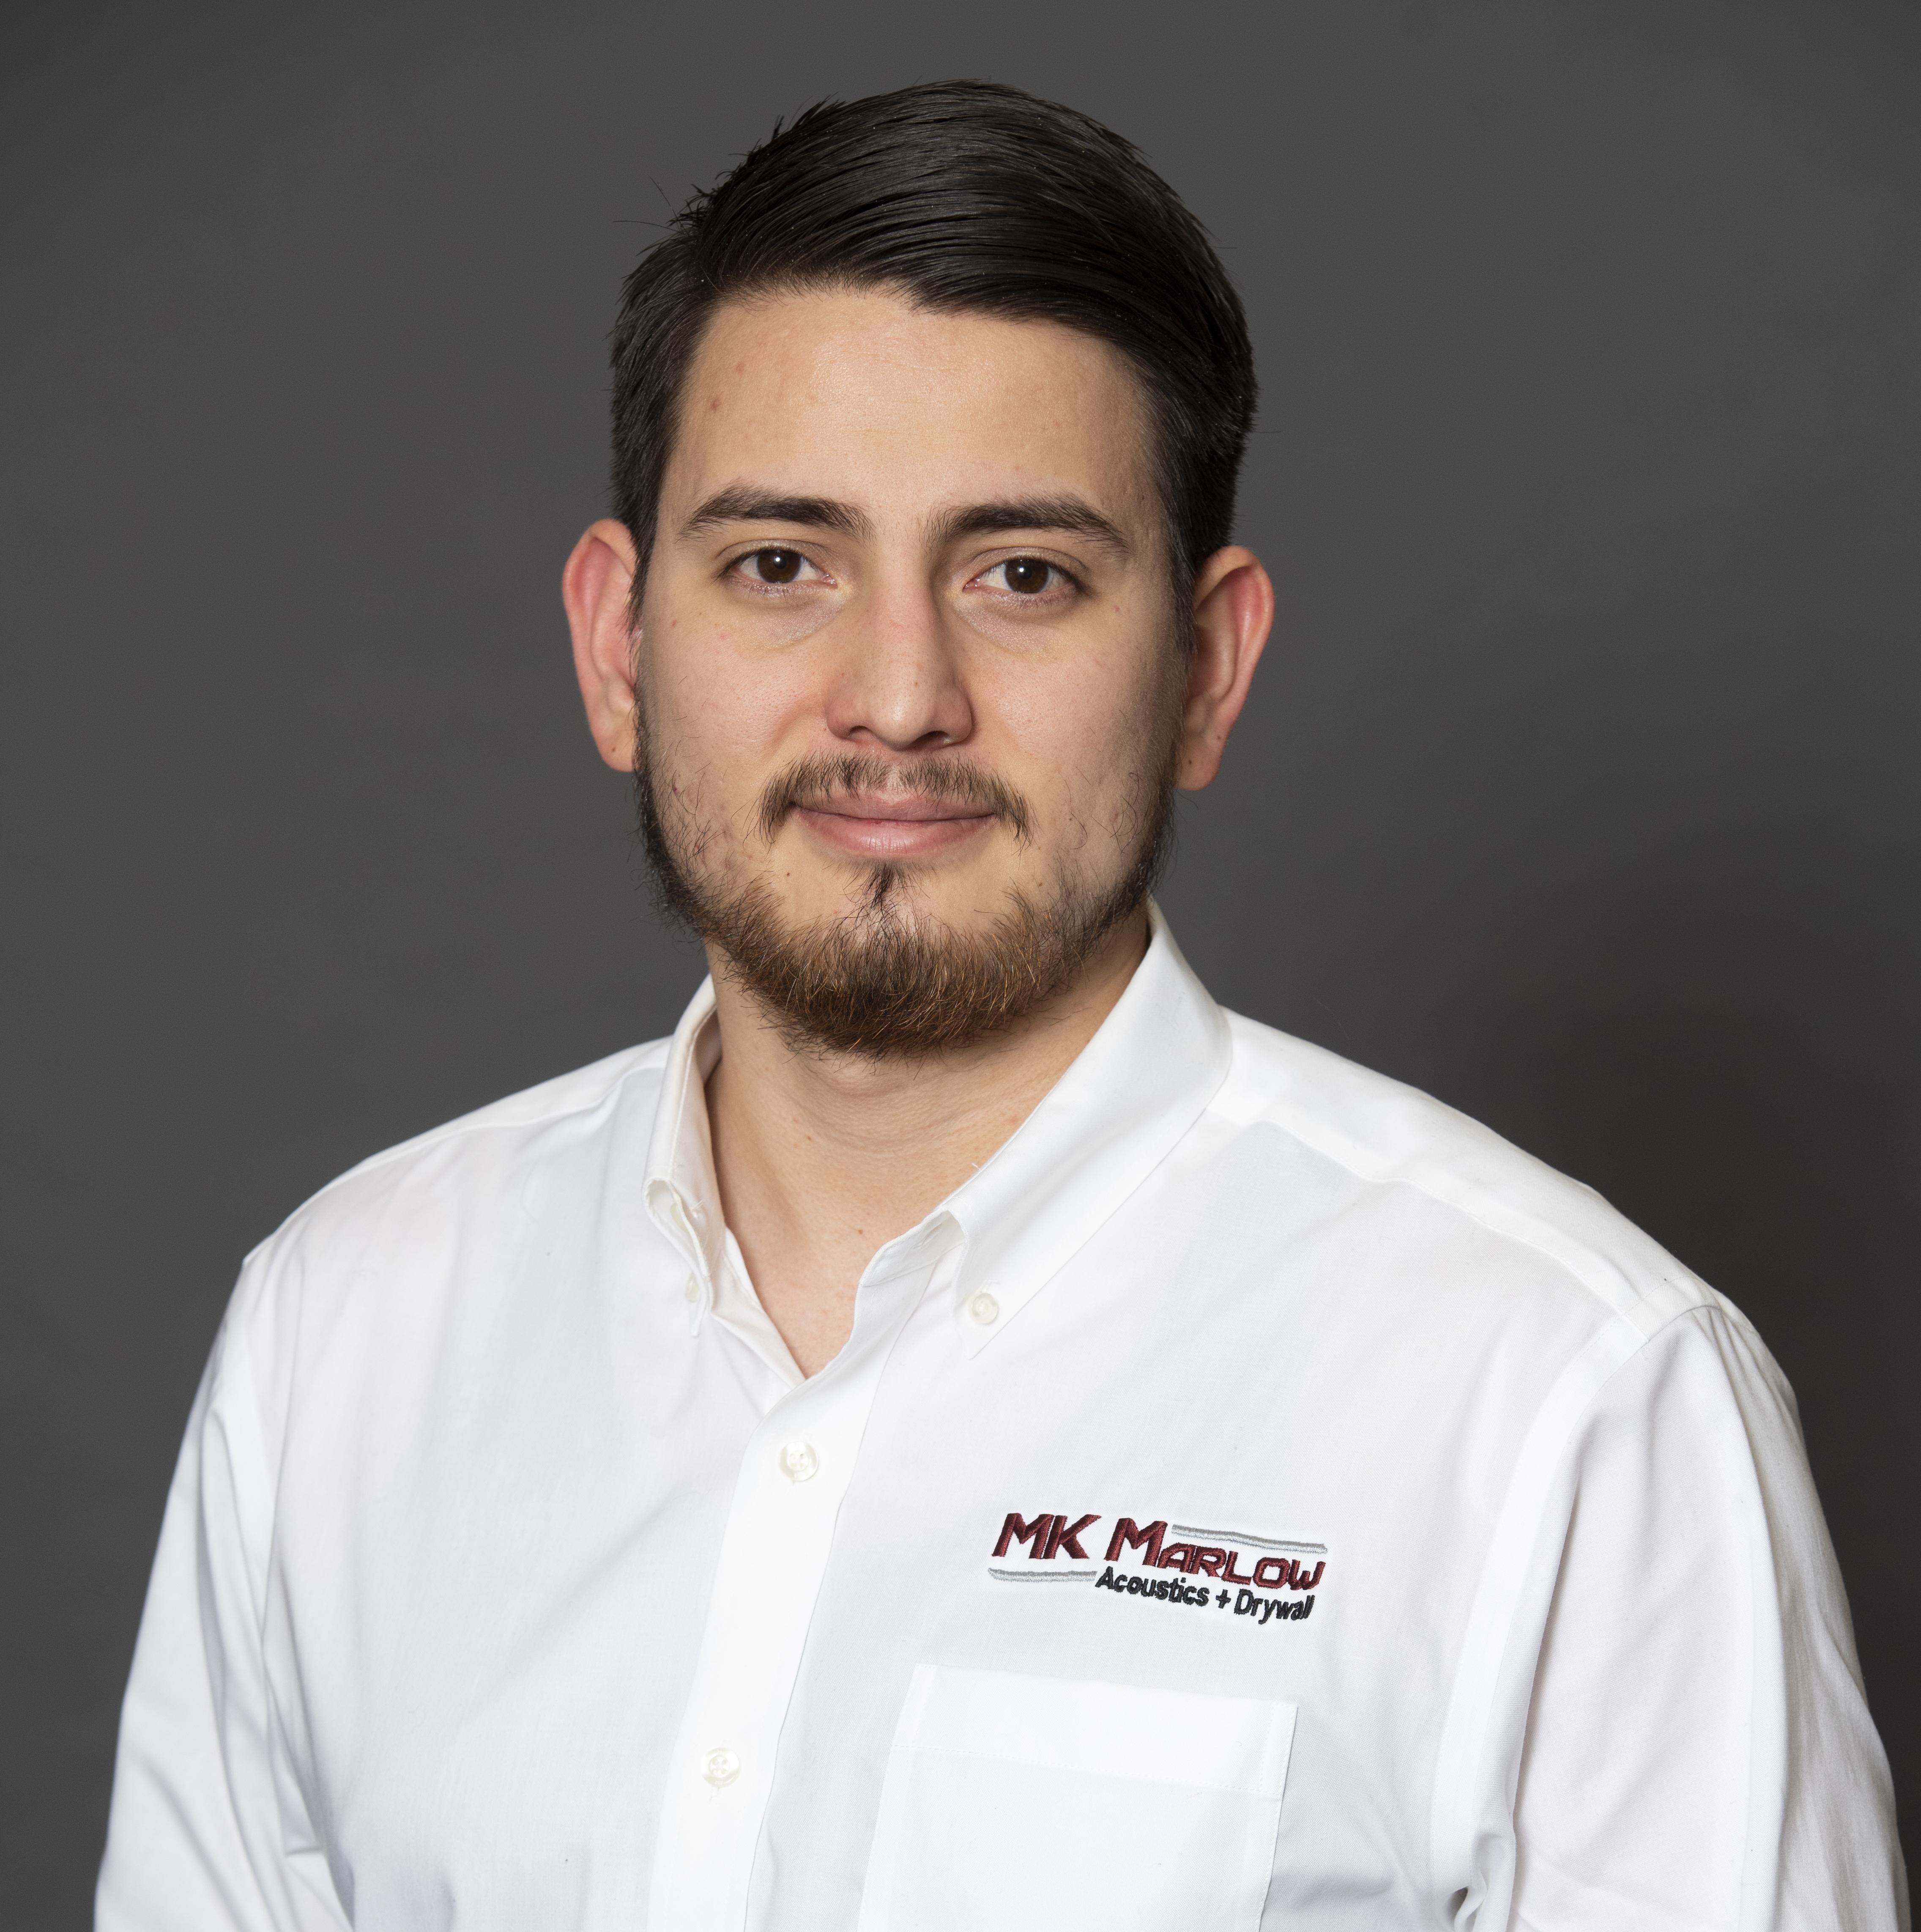 Daniel Espinoza